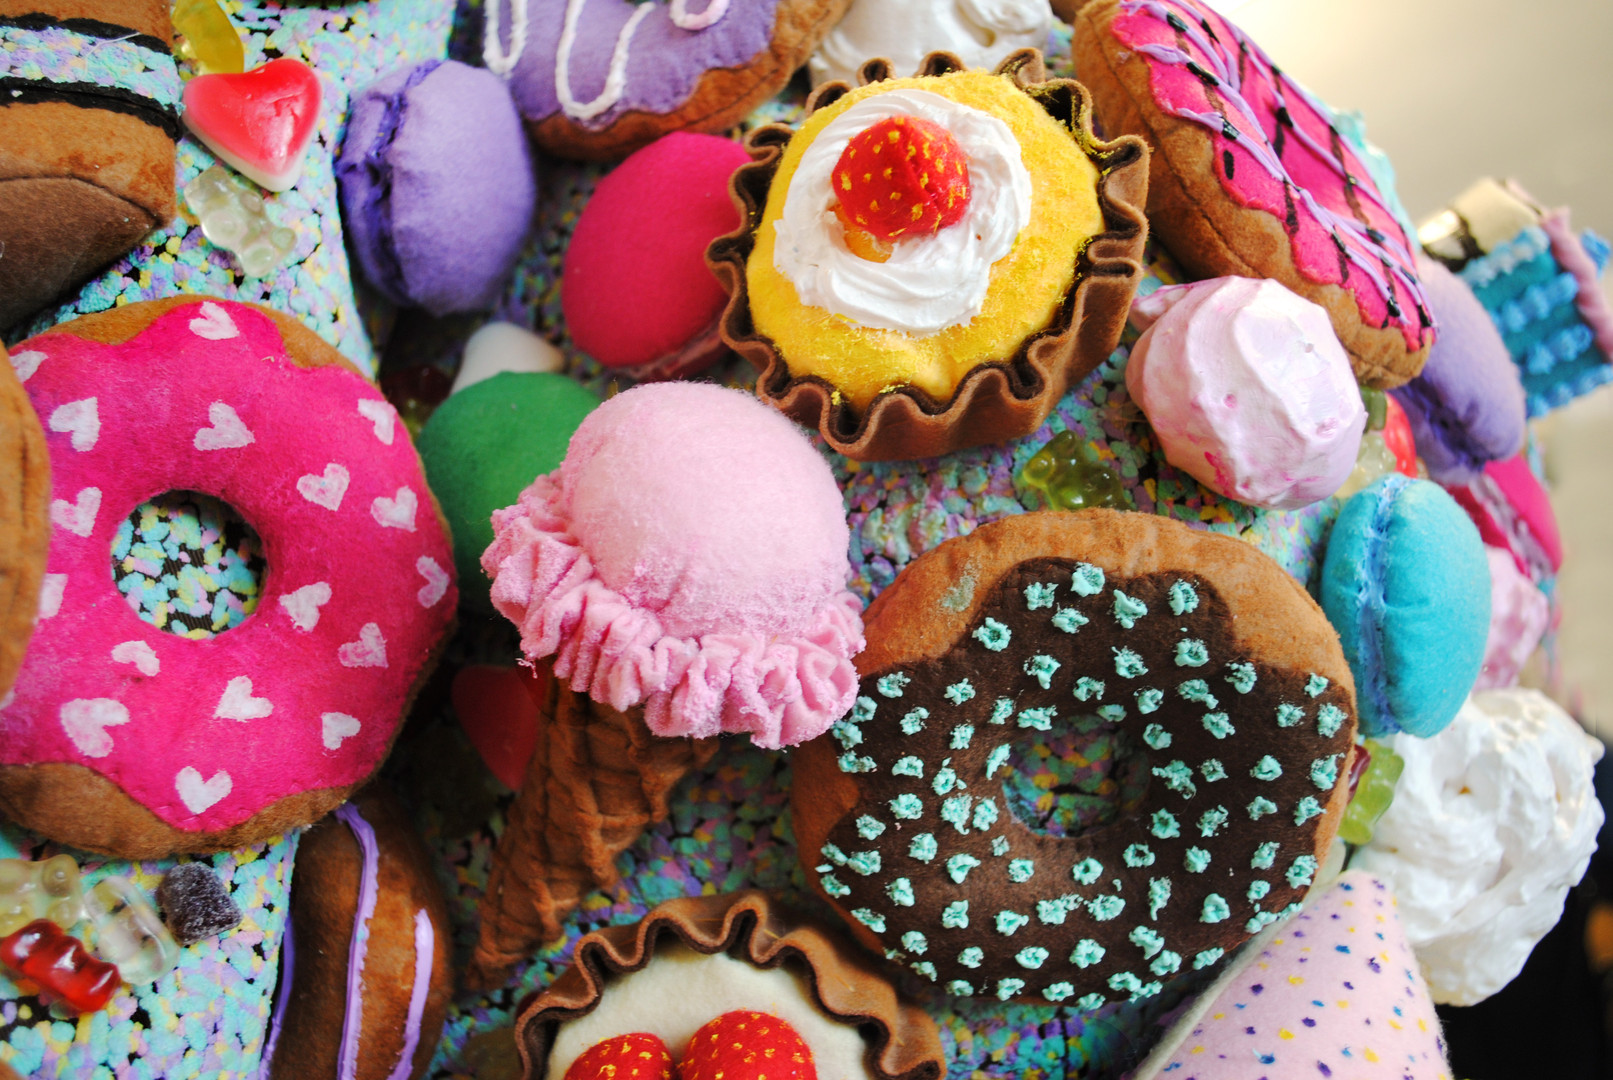 Ice cream cones and doughnuts